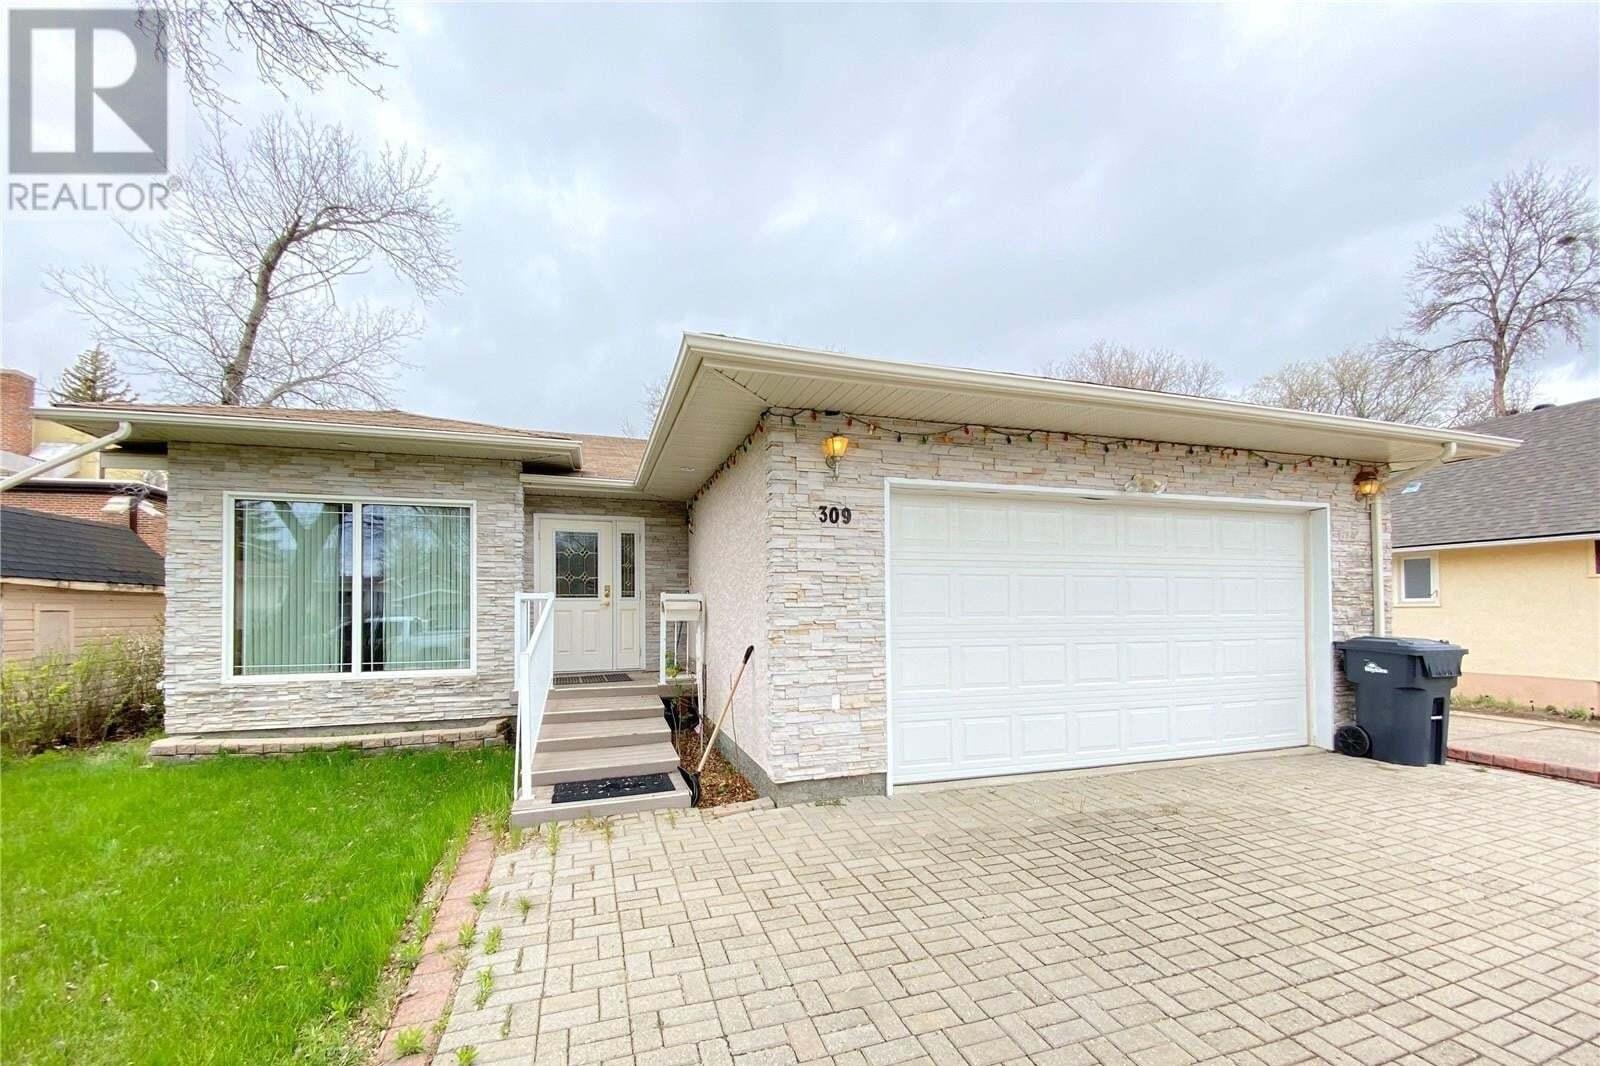 House for sale at 309 4th St NE Weyburn Saskatchewan - MLS: SK808570